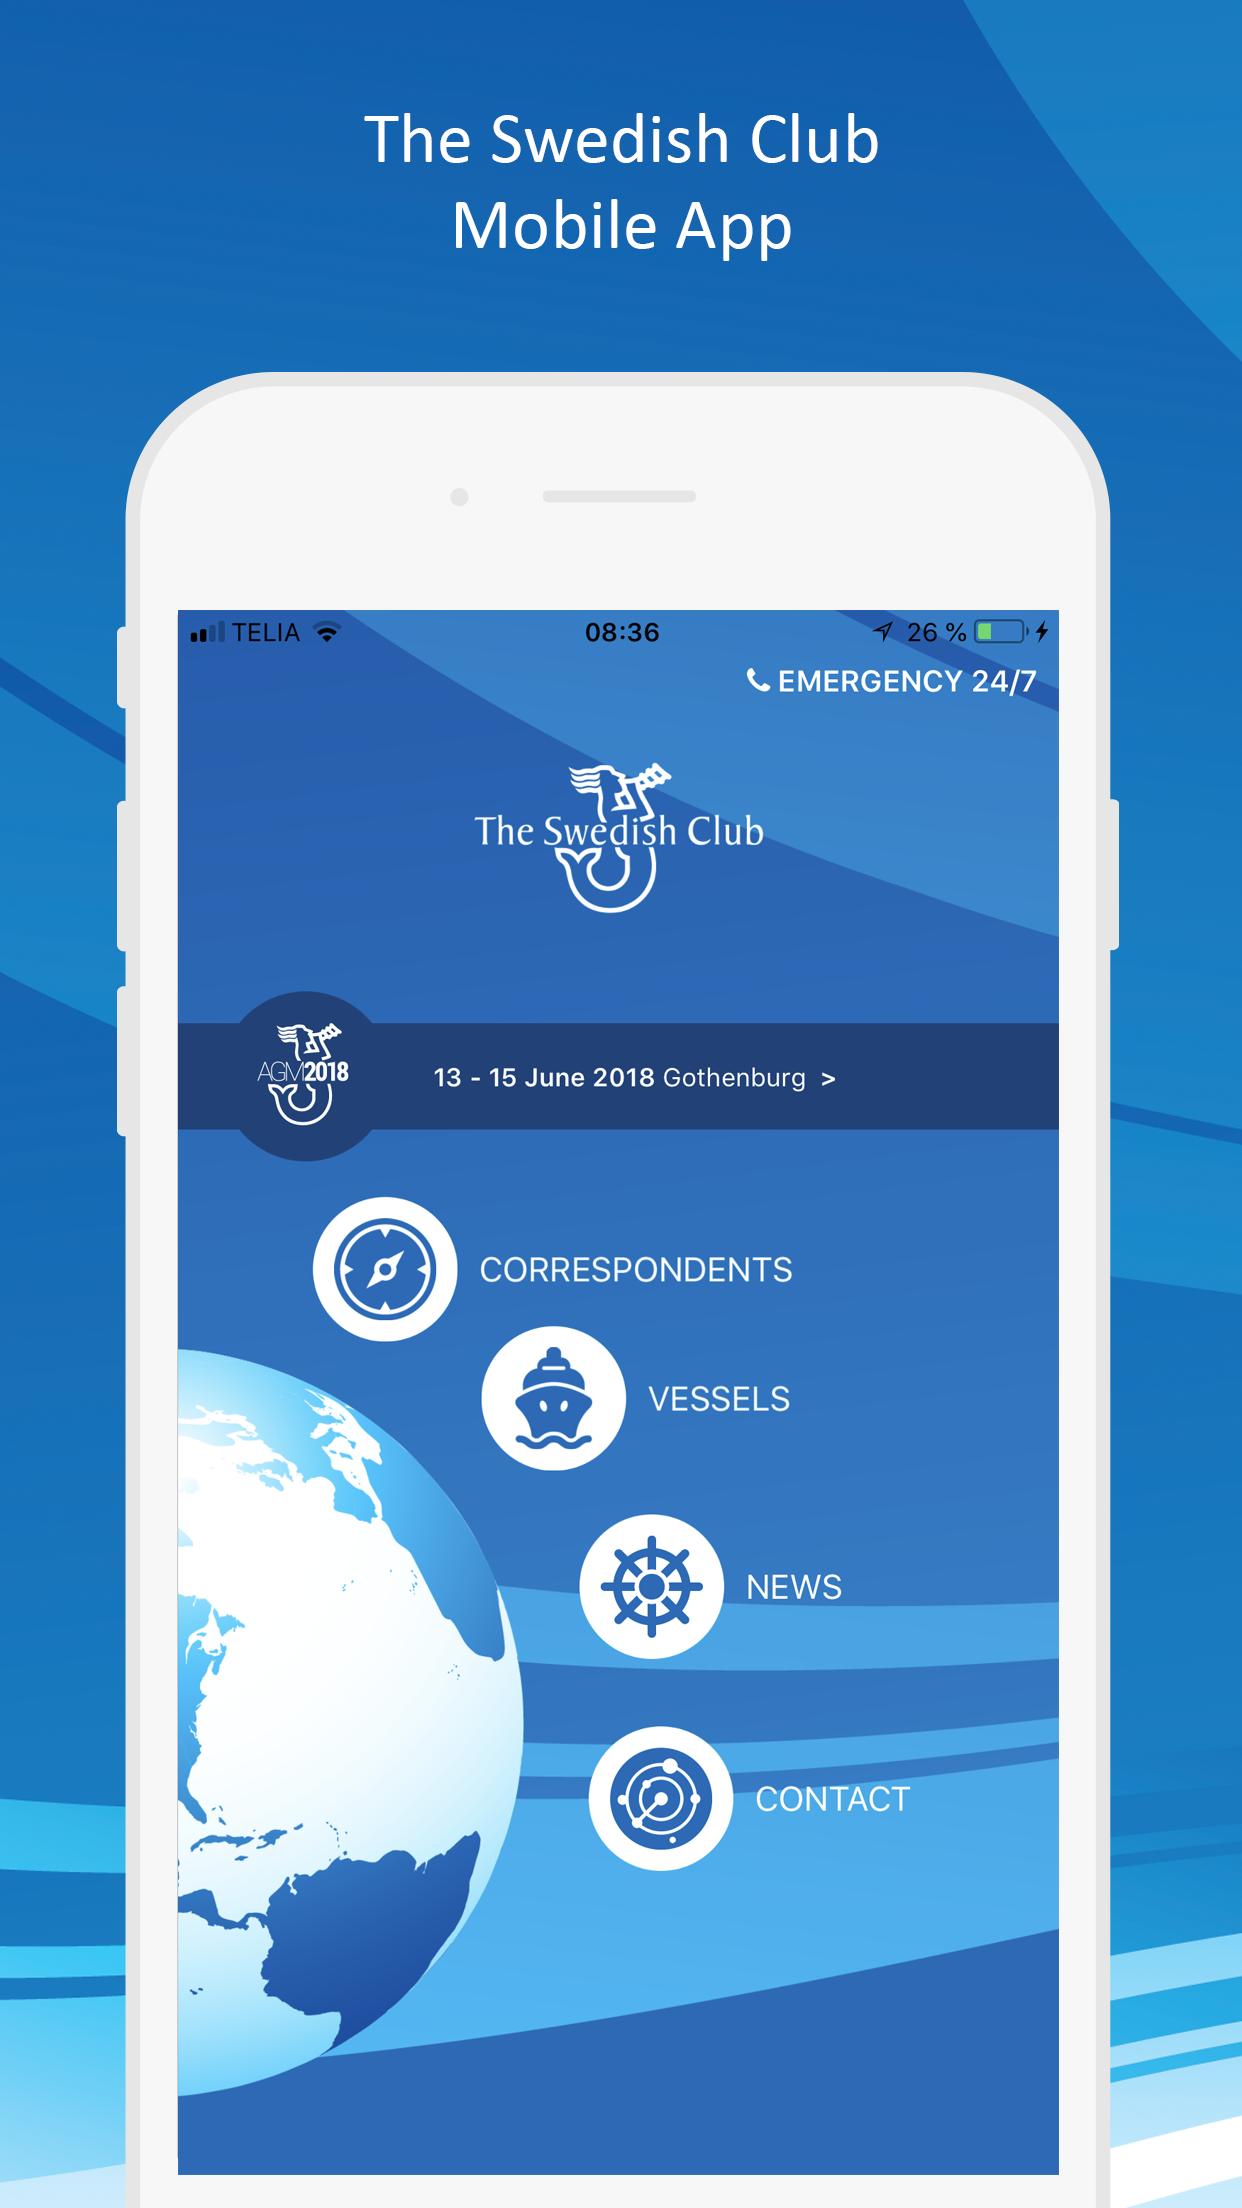 The Swedish Club App